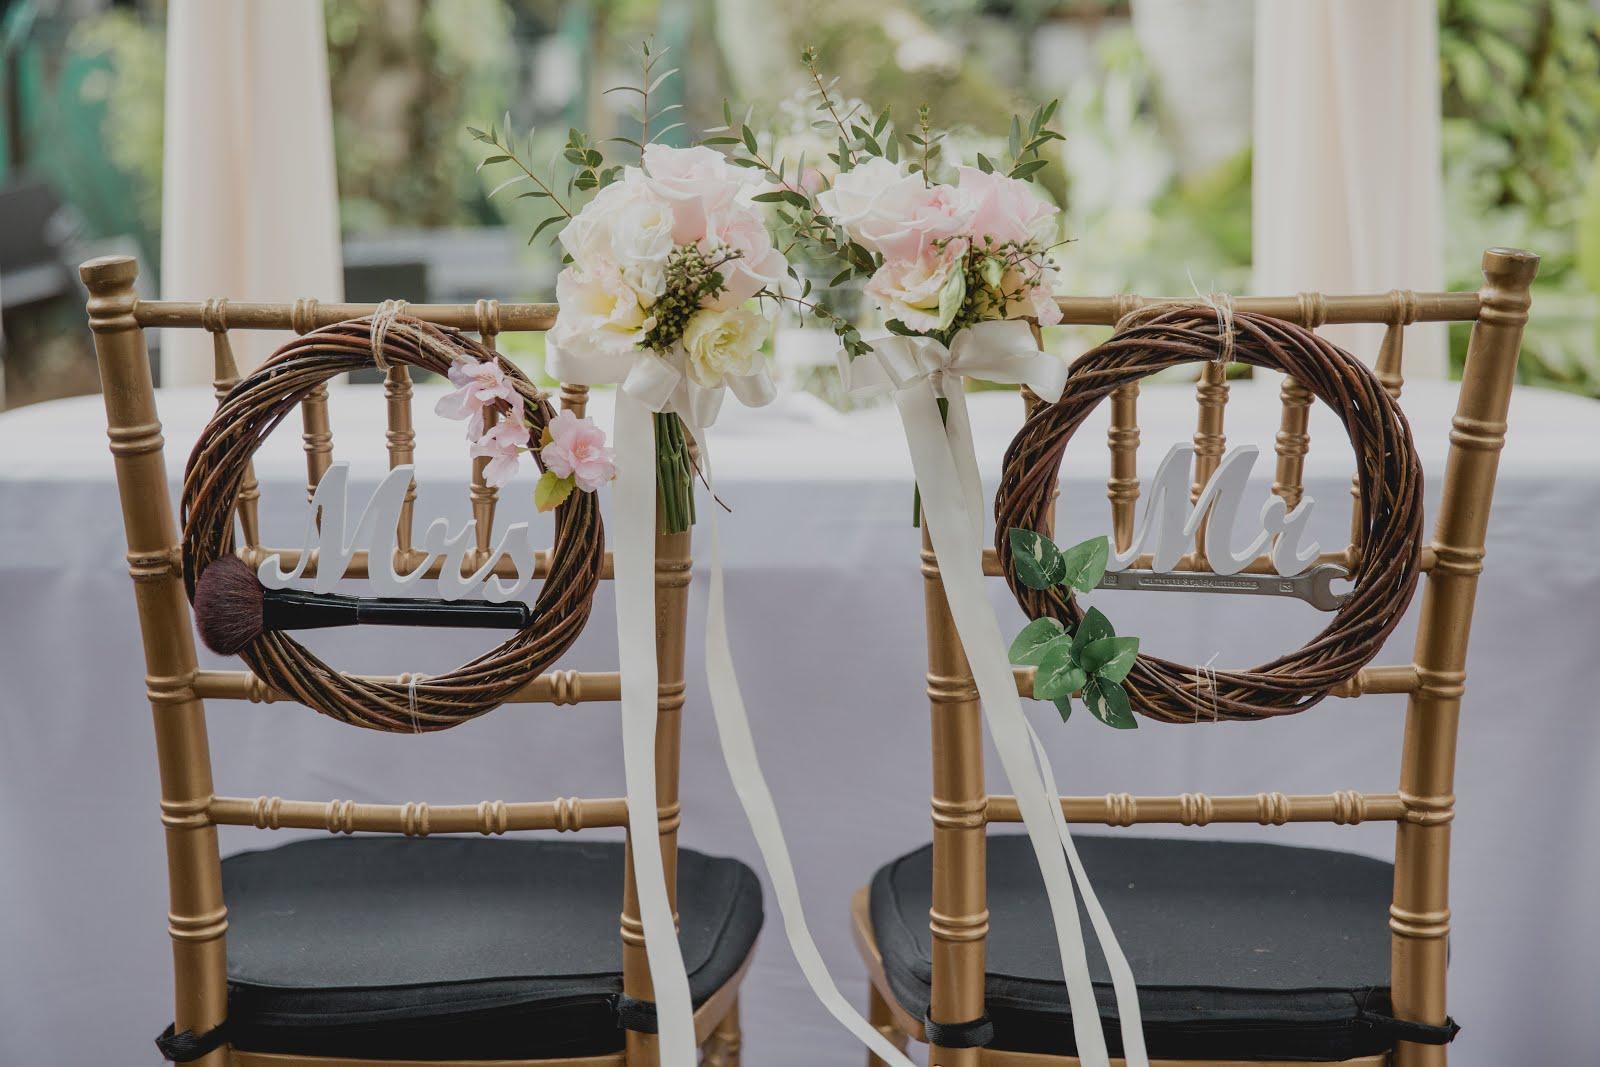 1 Create A Concept Of Your Dream Wedding Then Explore More Economical Alternatives